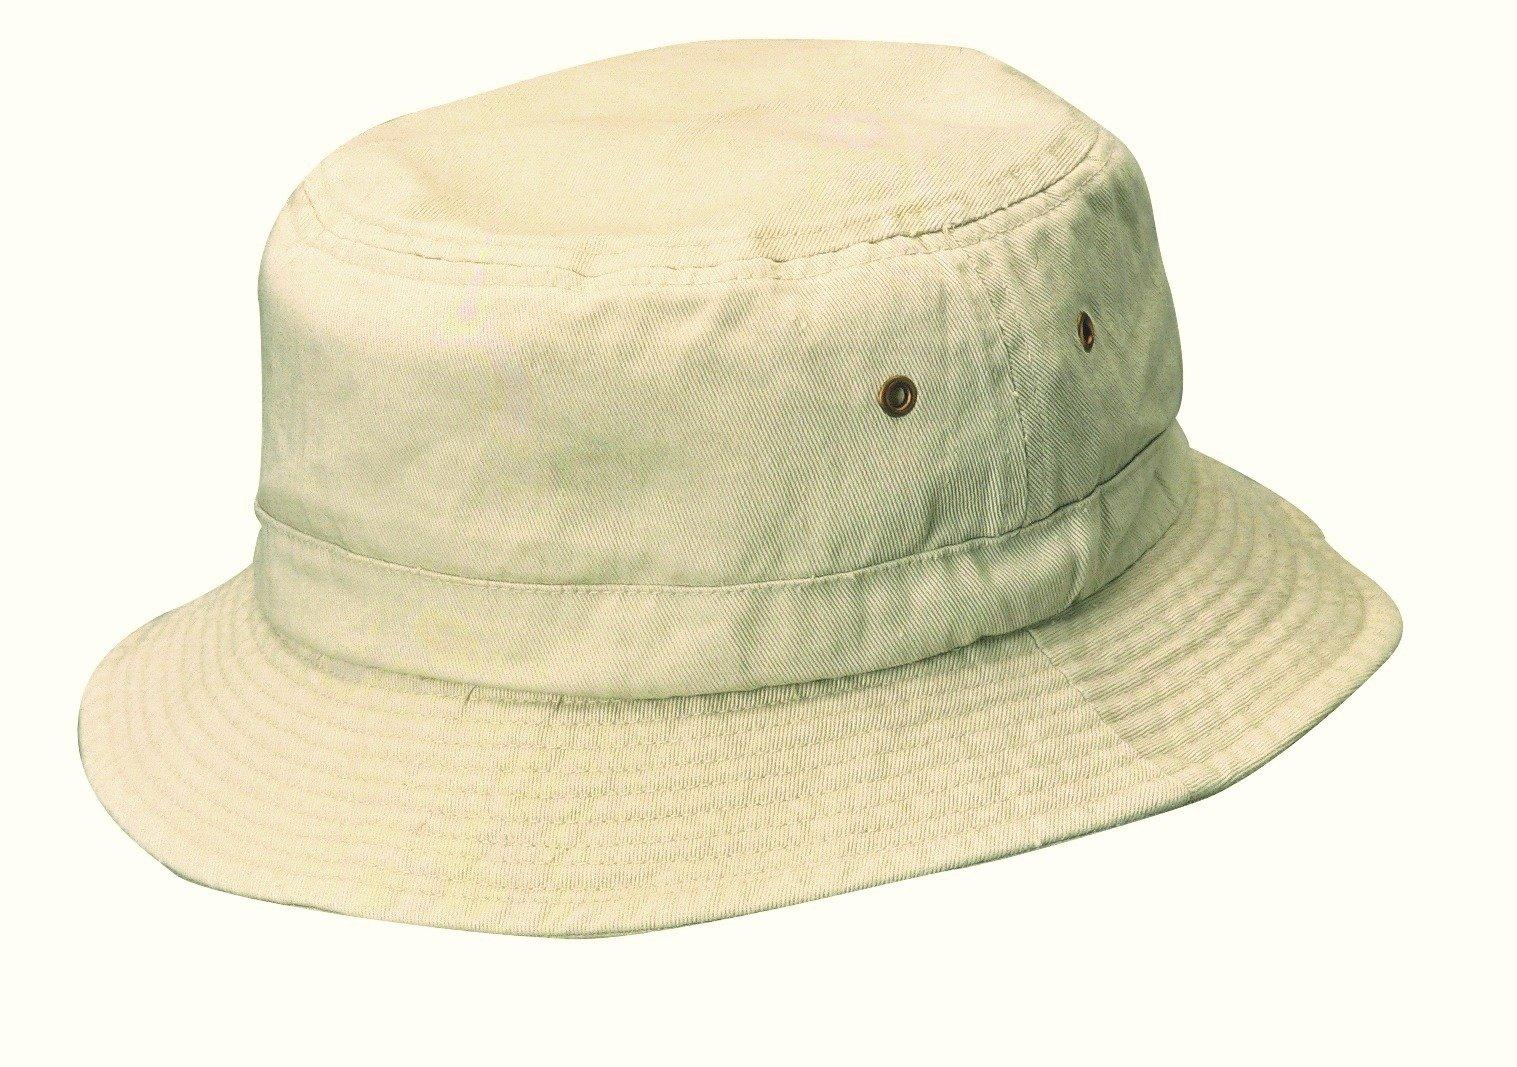 959c394cb75 Galleon - Dorfman Pacific Cotton Packable Summer Travel Bucket Hat ...